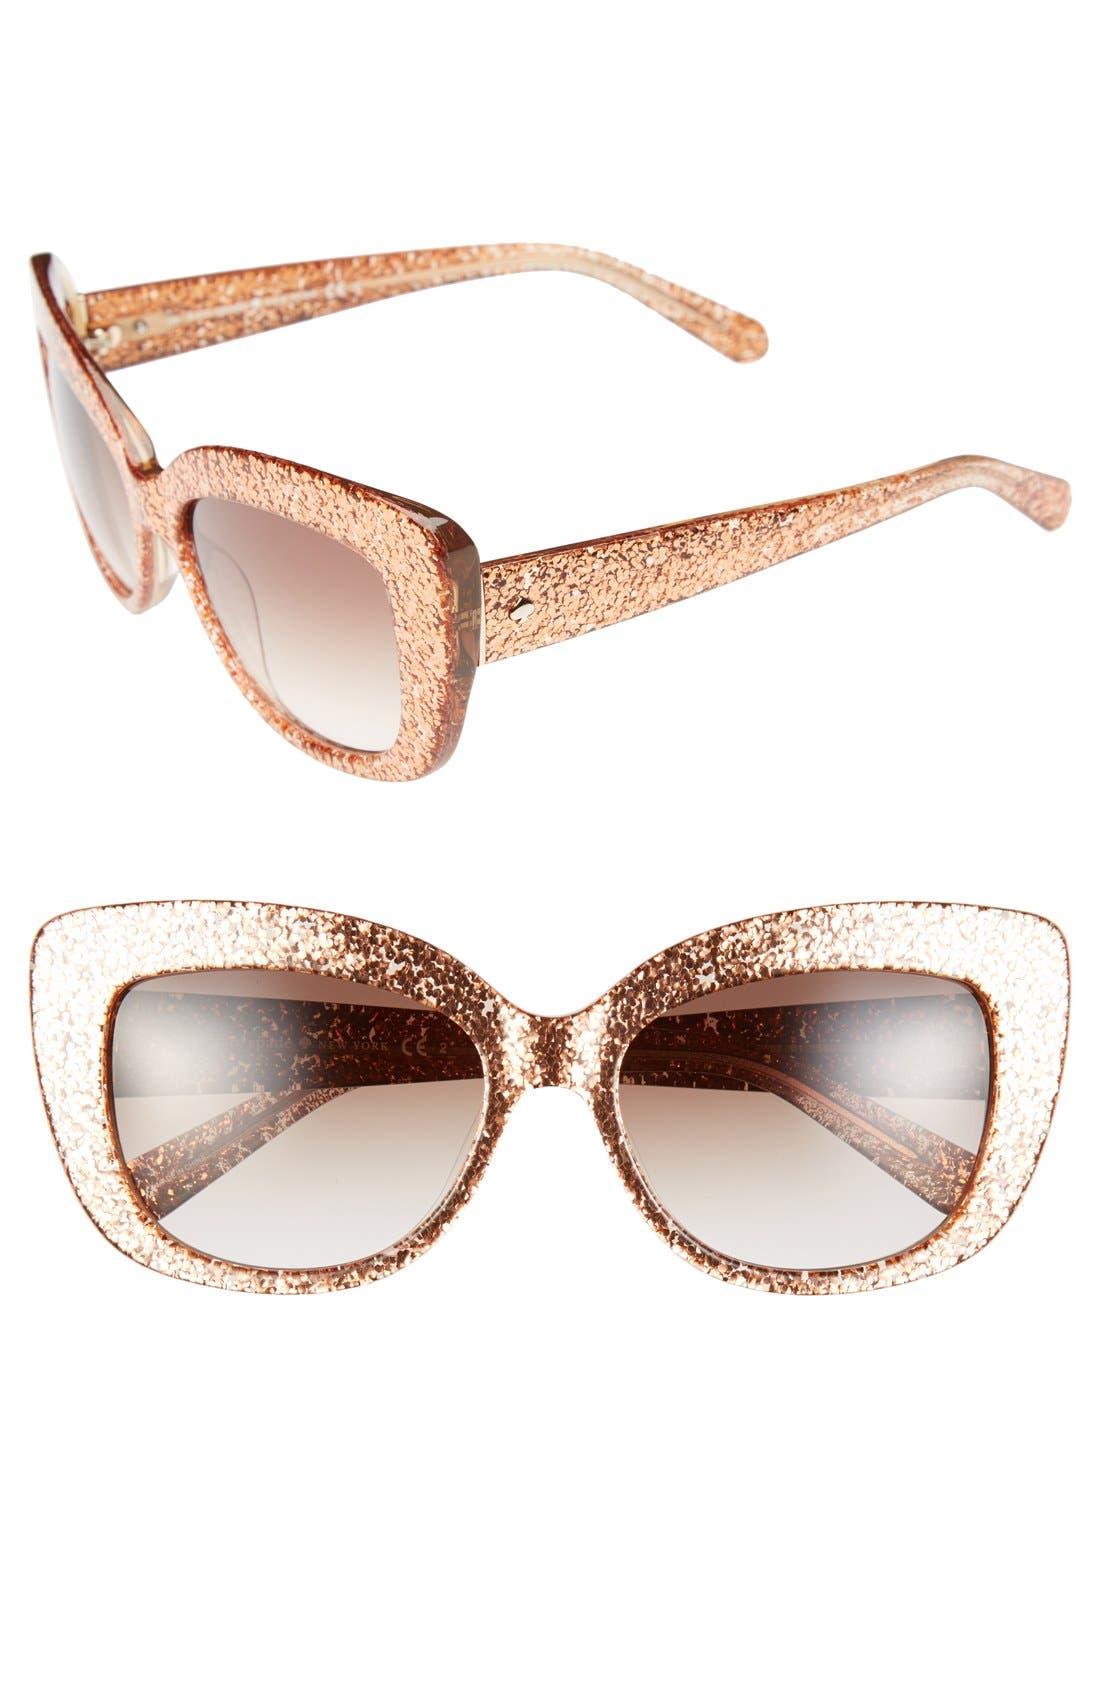 Main Image - kate spade new york 55mm cat eye sunglasses